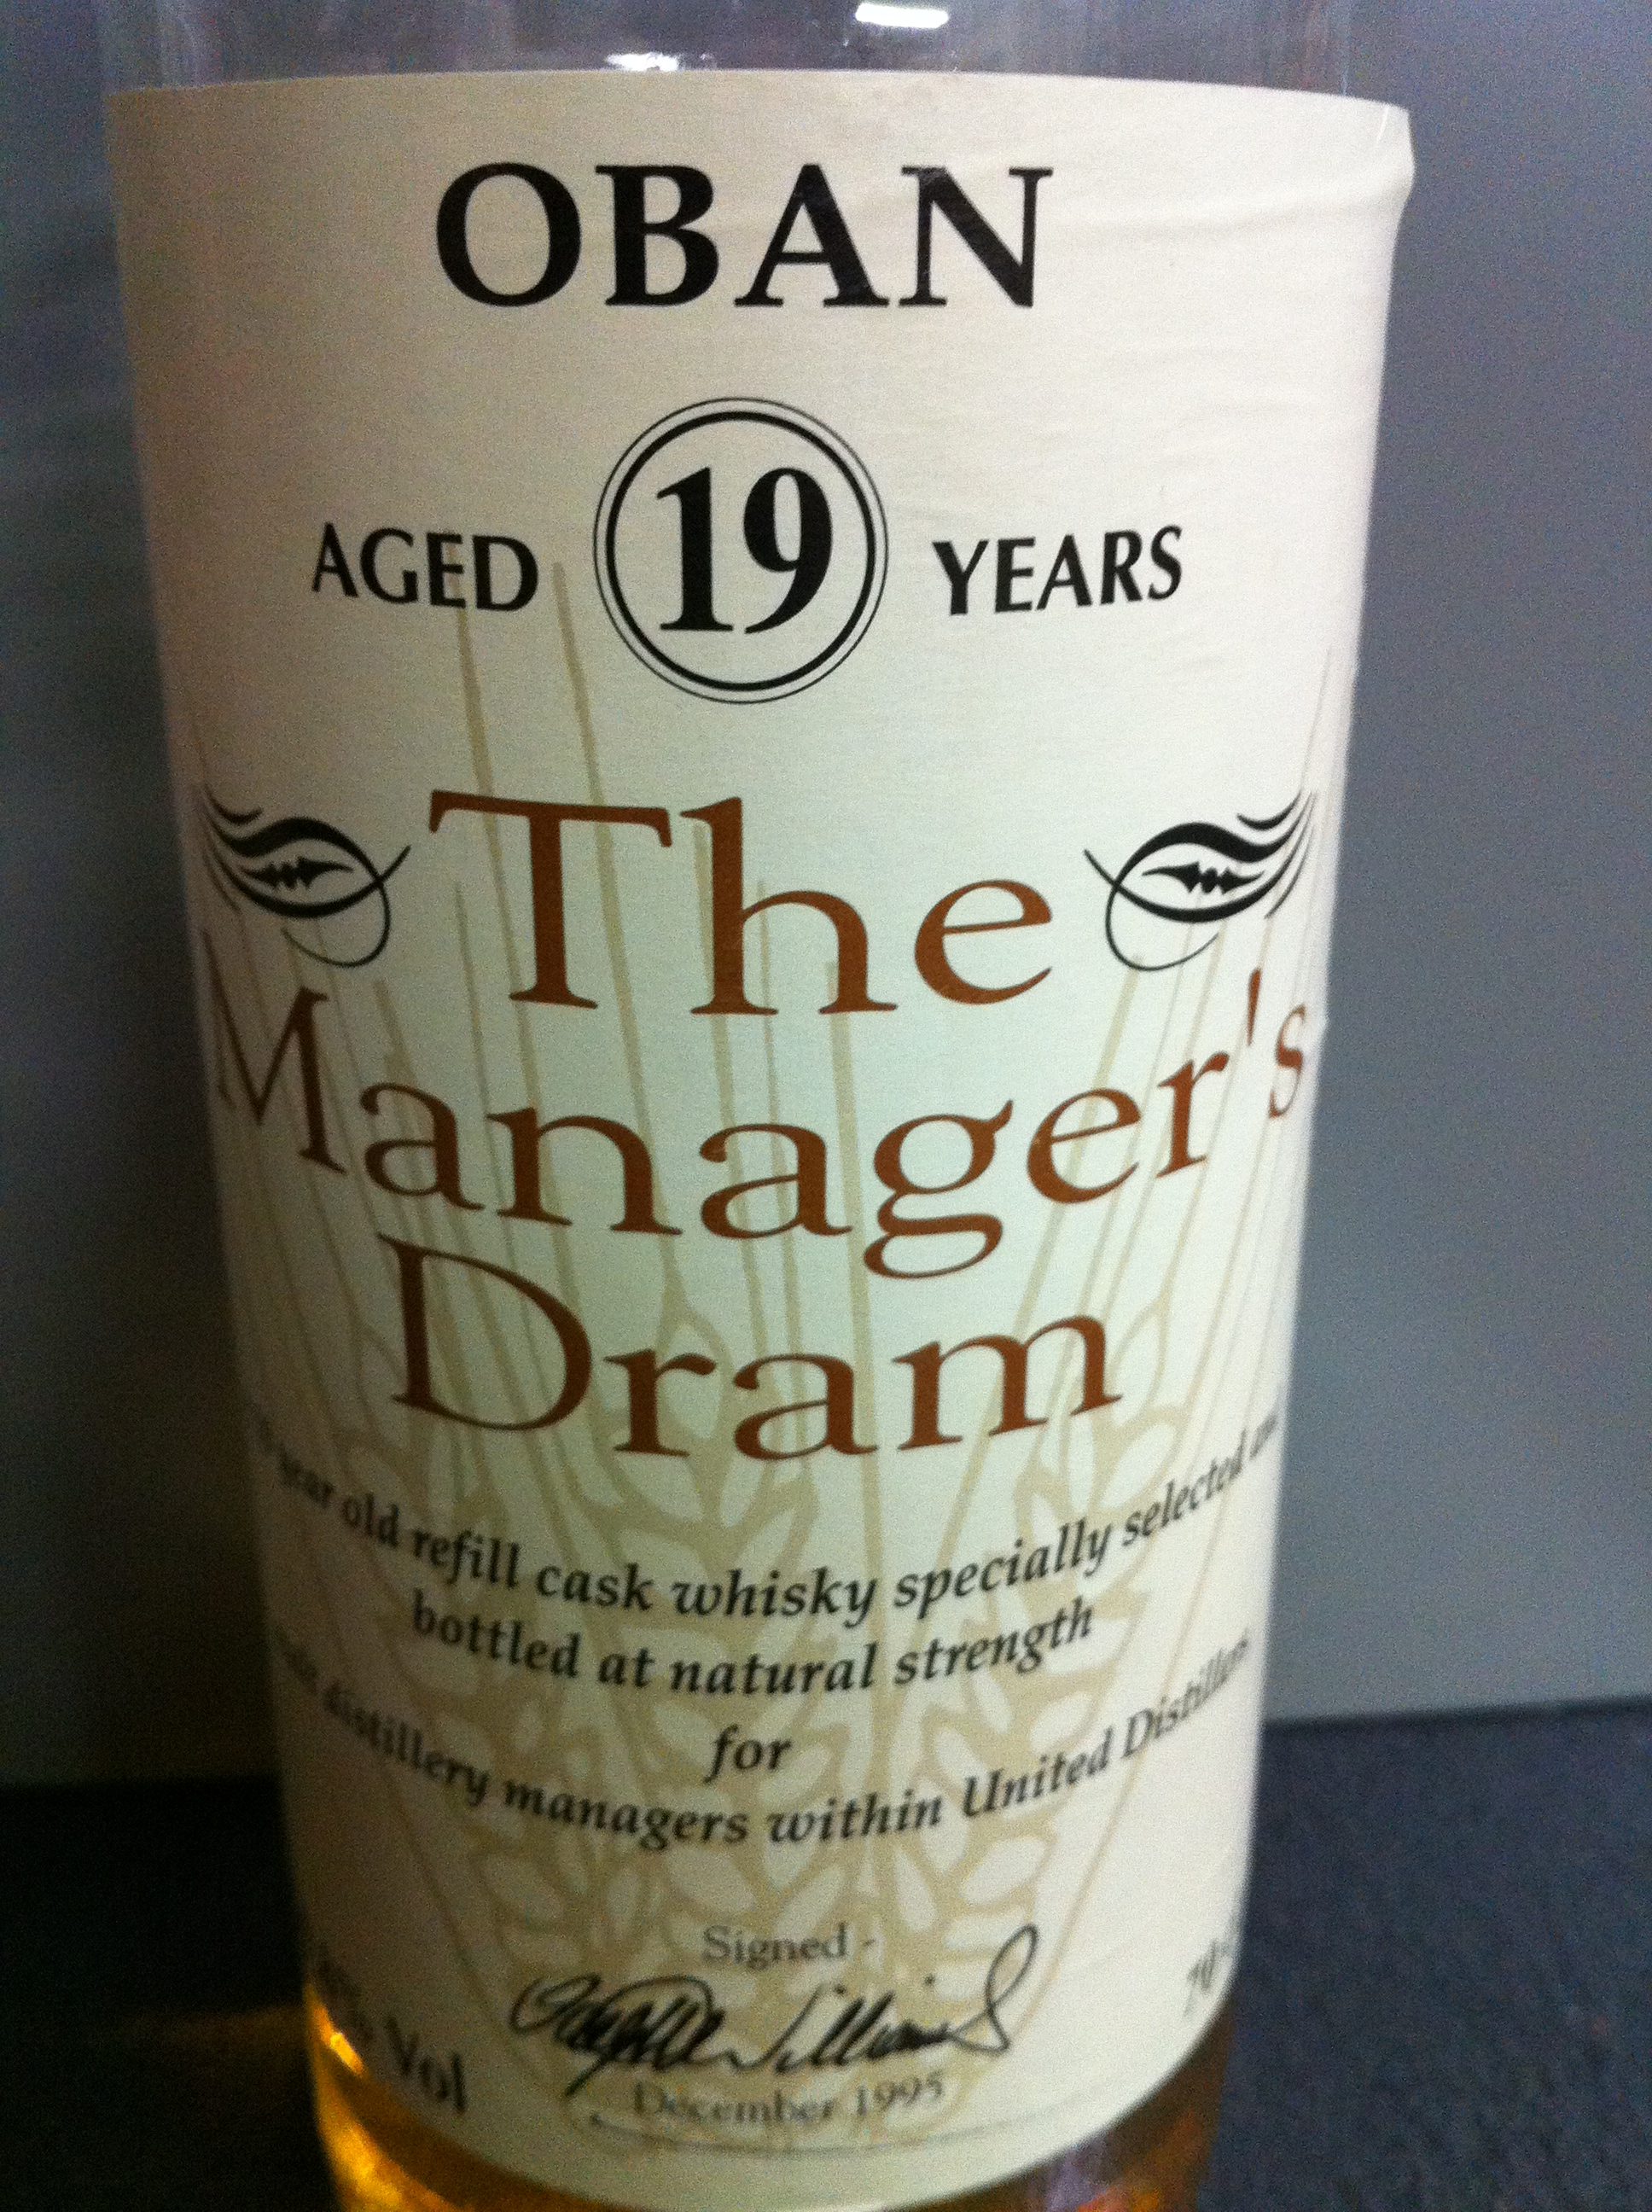 【Blind Tasting】【23-01-D】 Oban 19yo (59.8%, The Manager's Dram, B12/'95) 1995